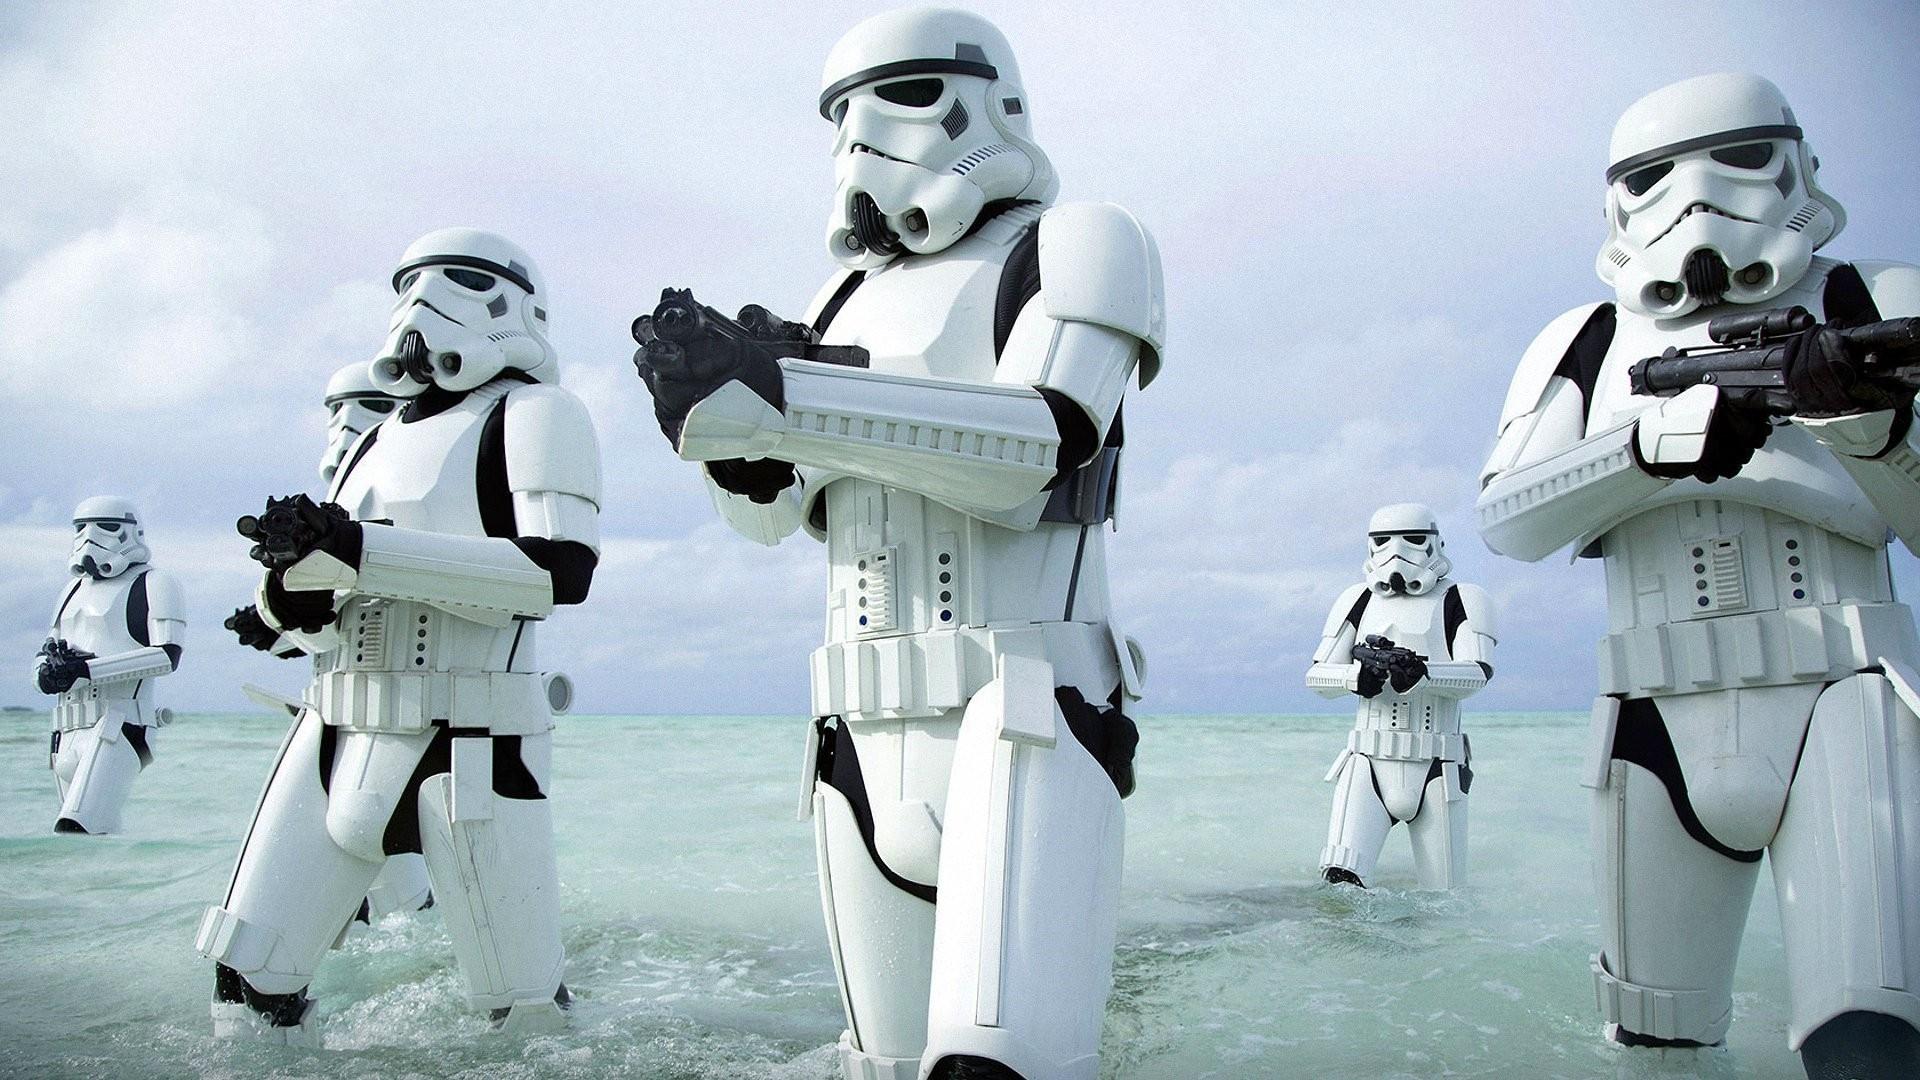 Stormtrooper hd desktop wallpaper